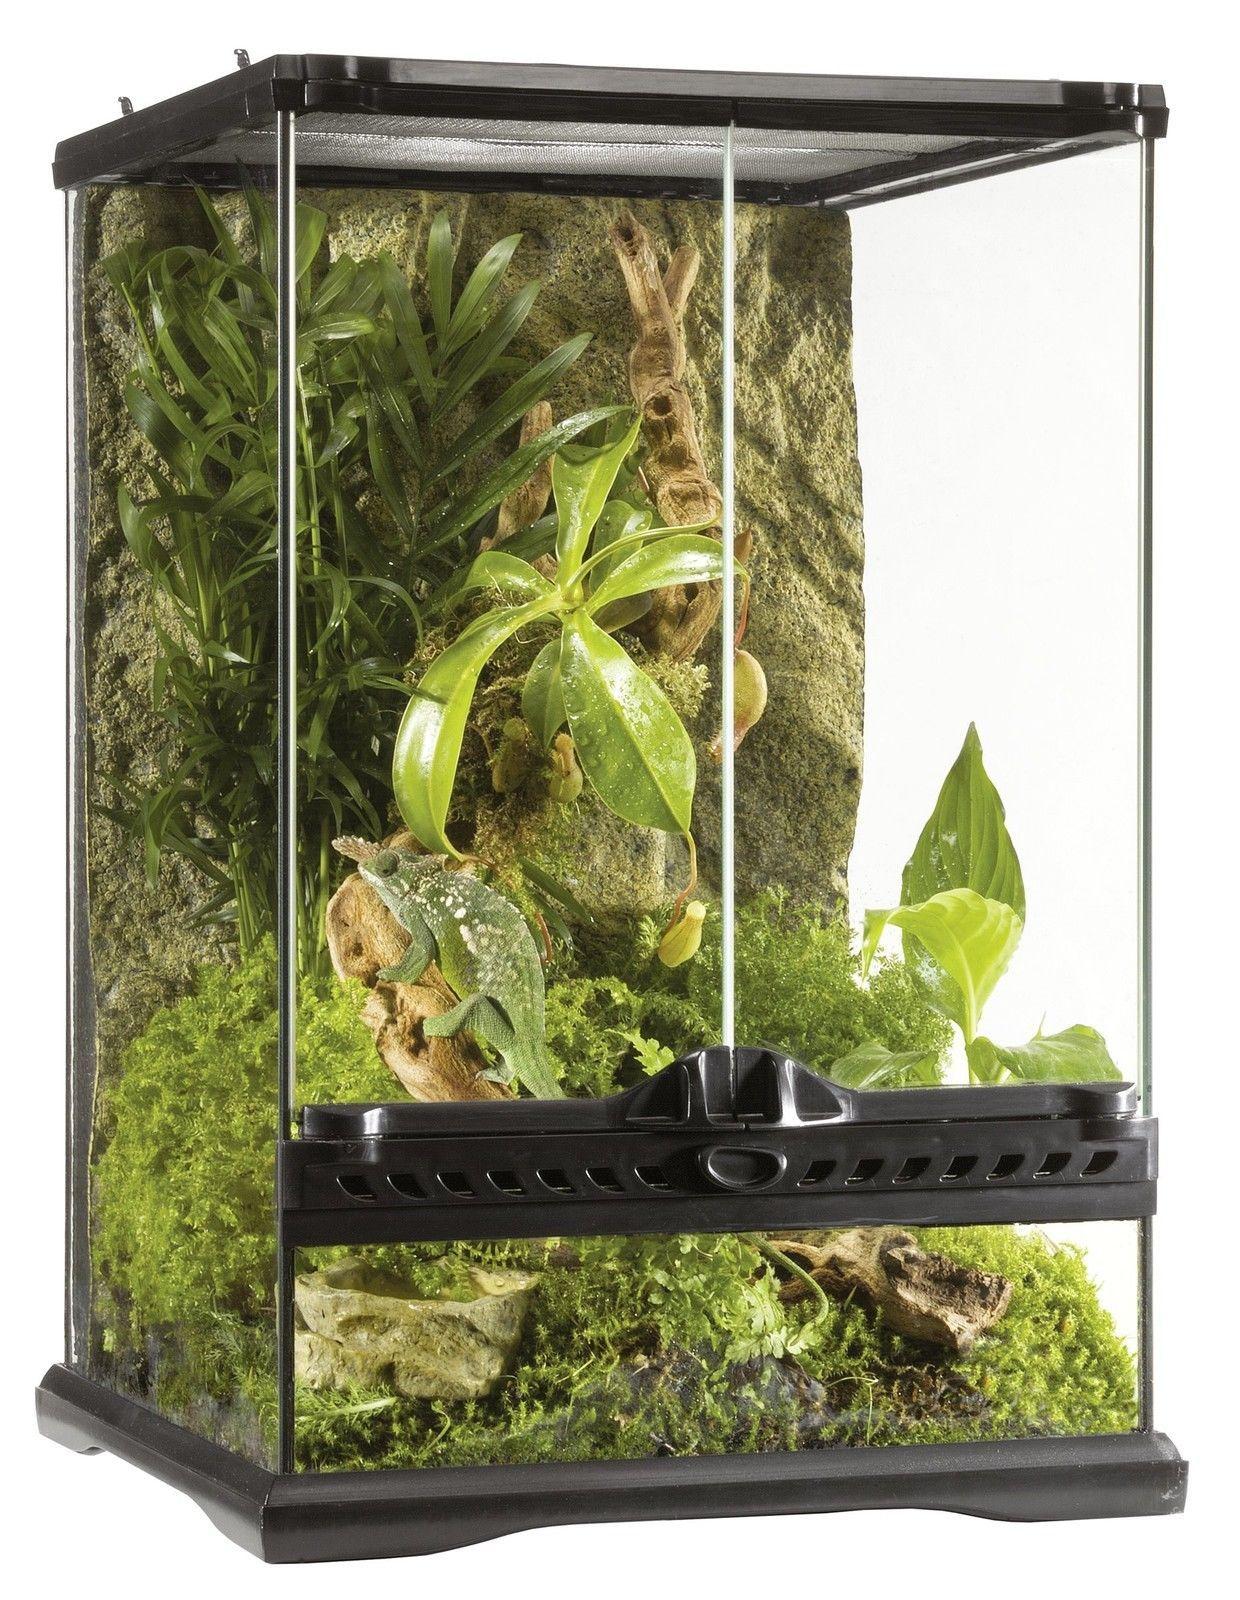 Reptile Glass Terrarium Frog Iguana Cage Snake Lizard Habitat Home